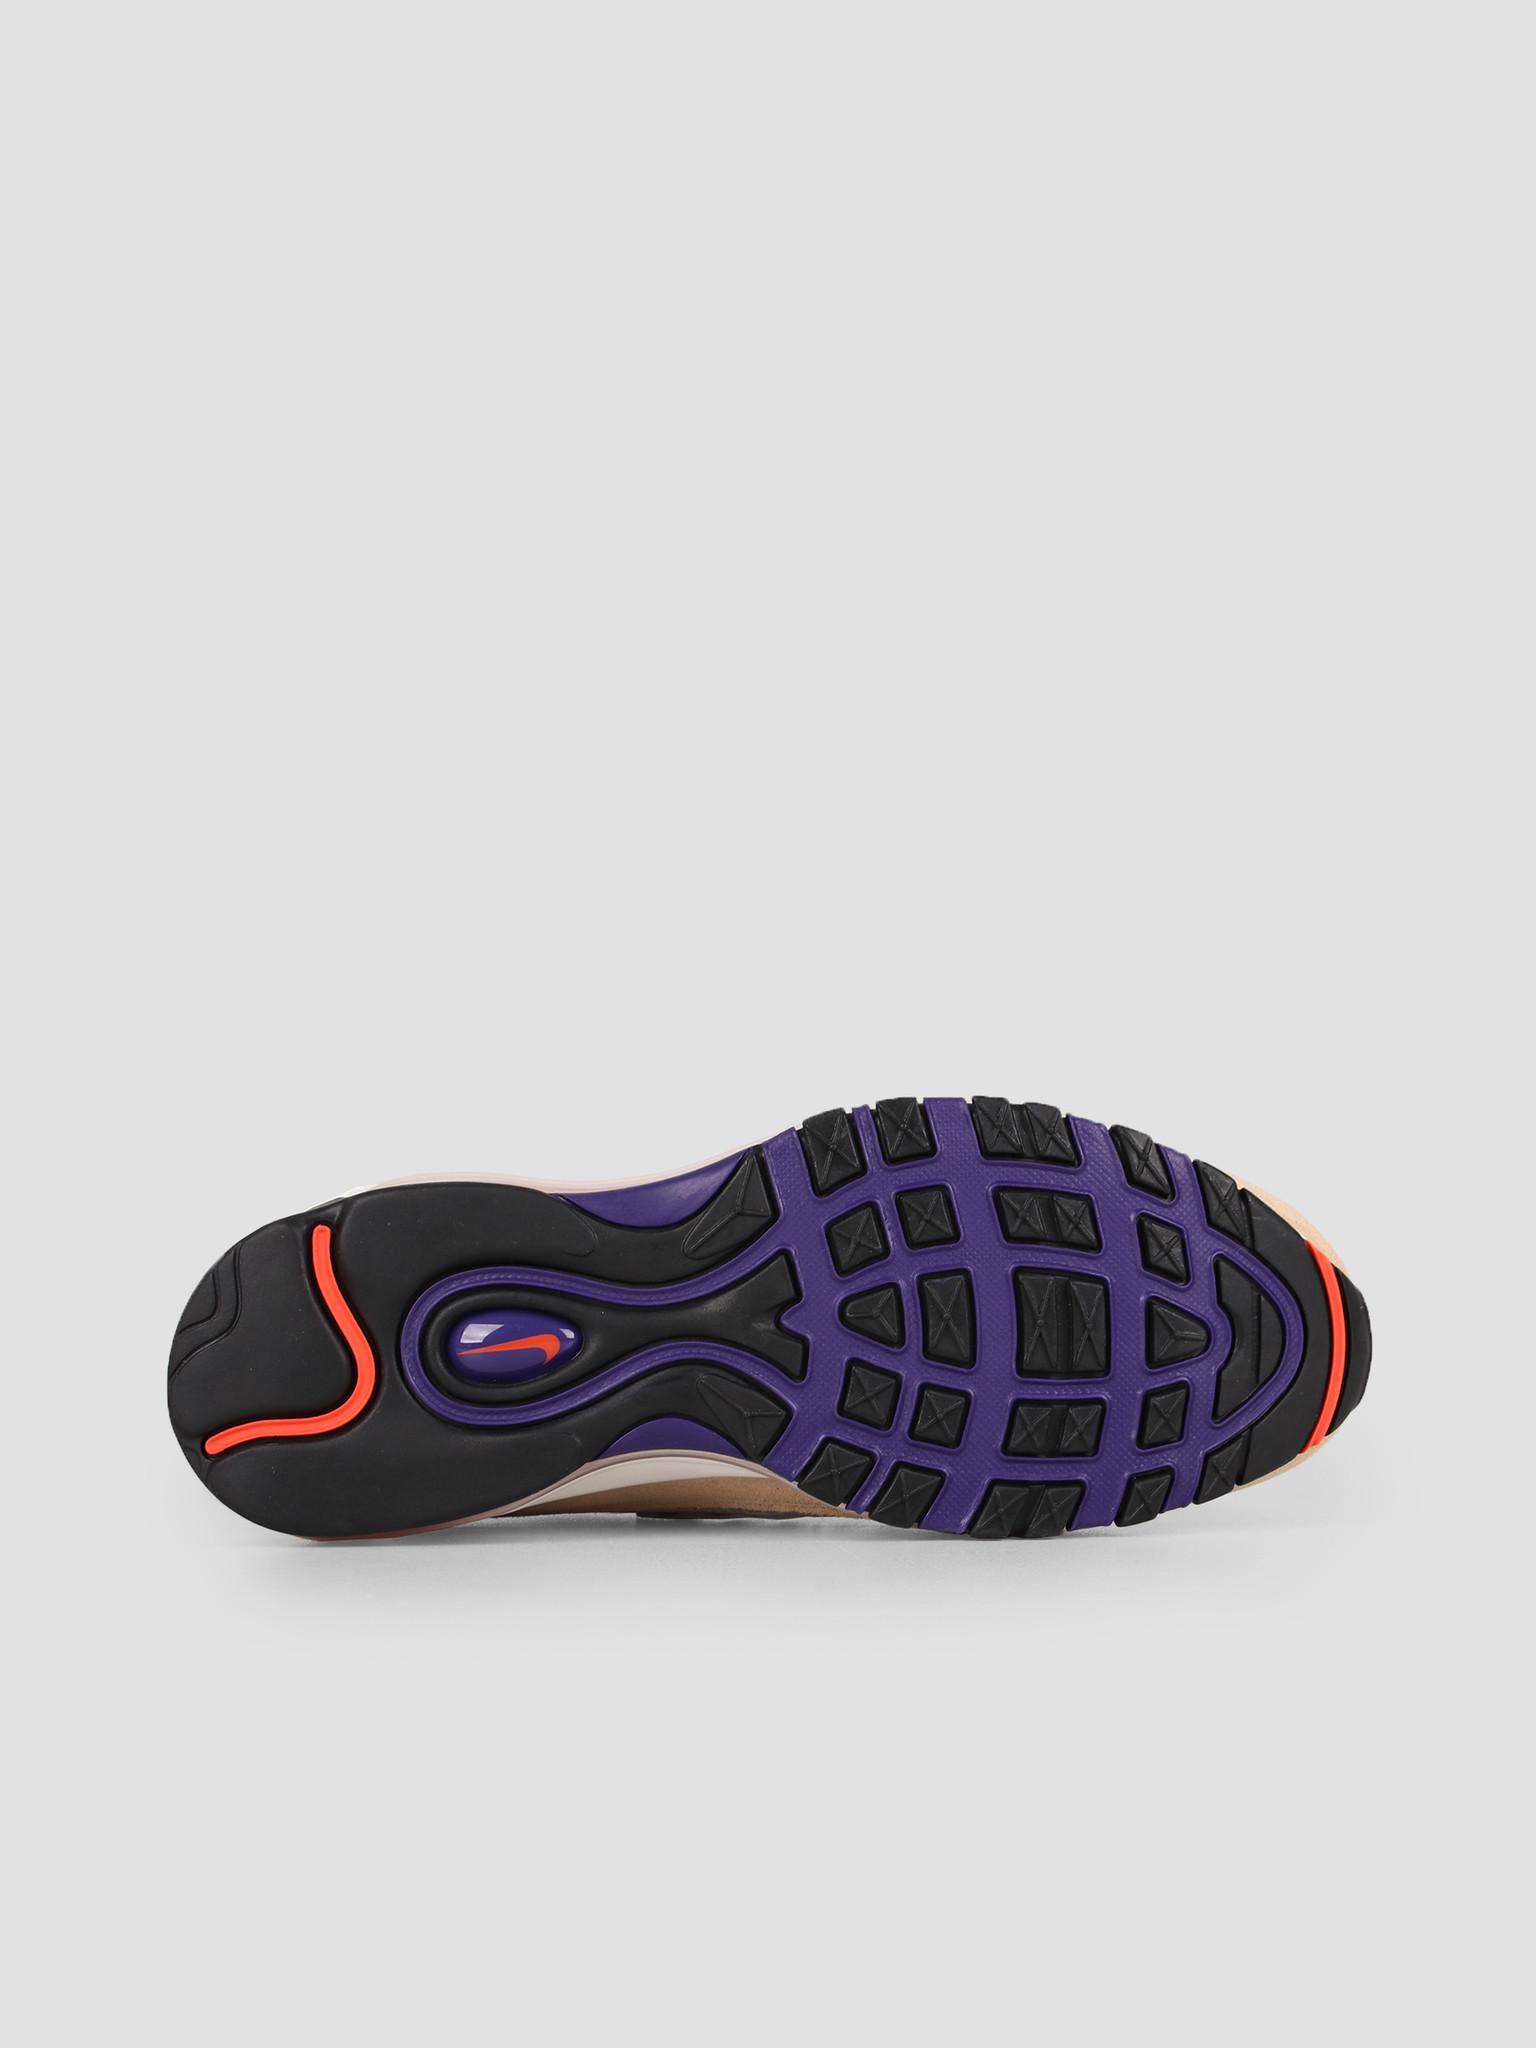 Nike Nike Air Max 98 Sail Court Purple Light Cream Desert Ore 640744-108